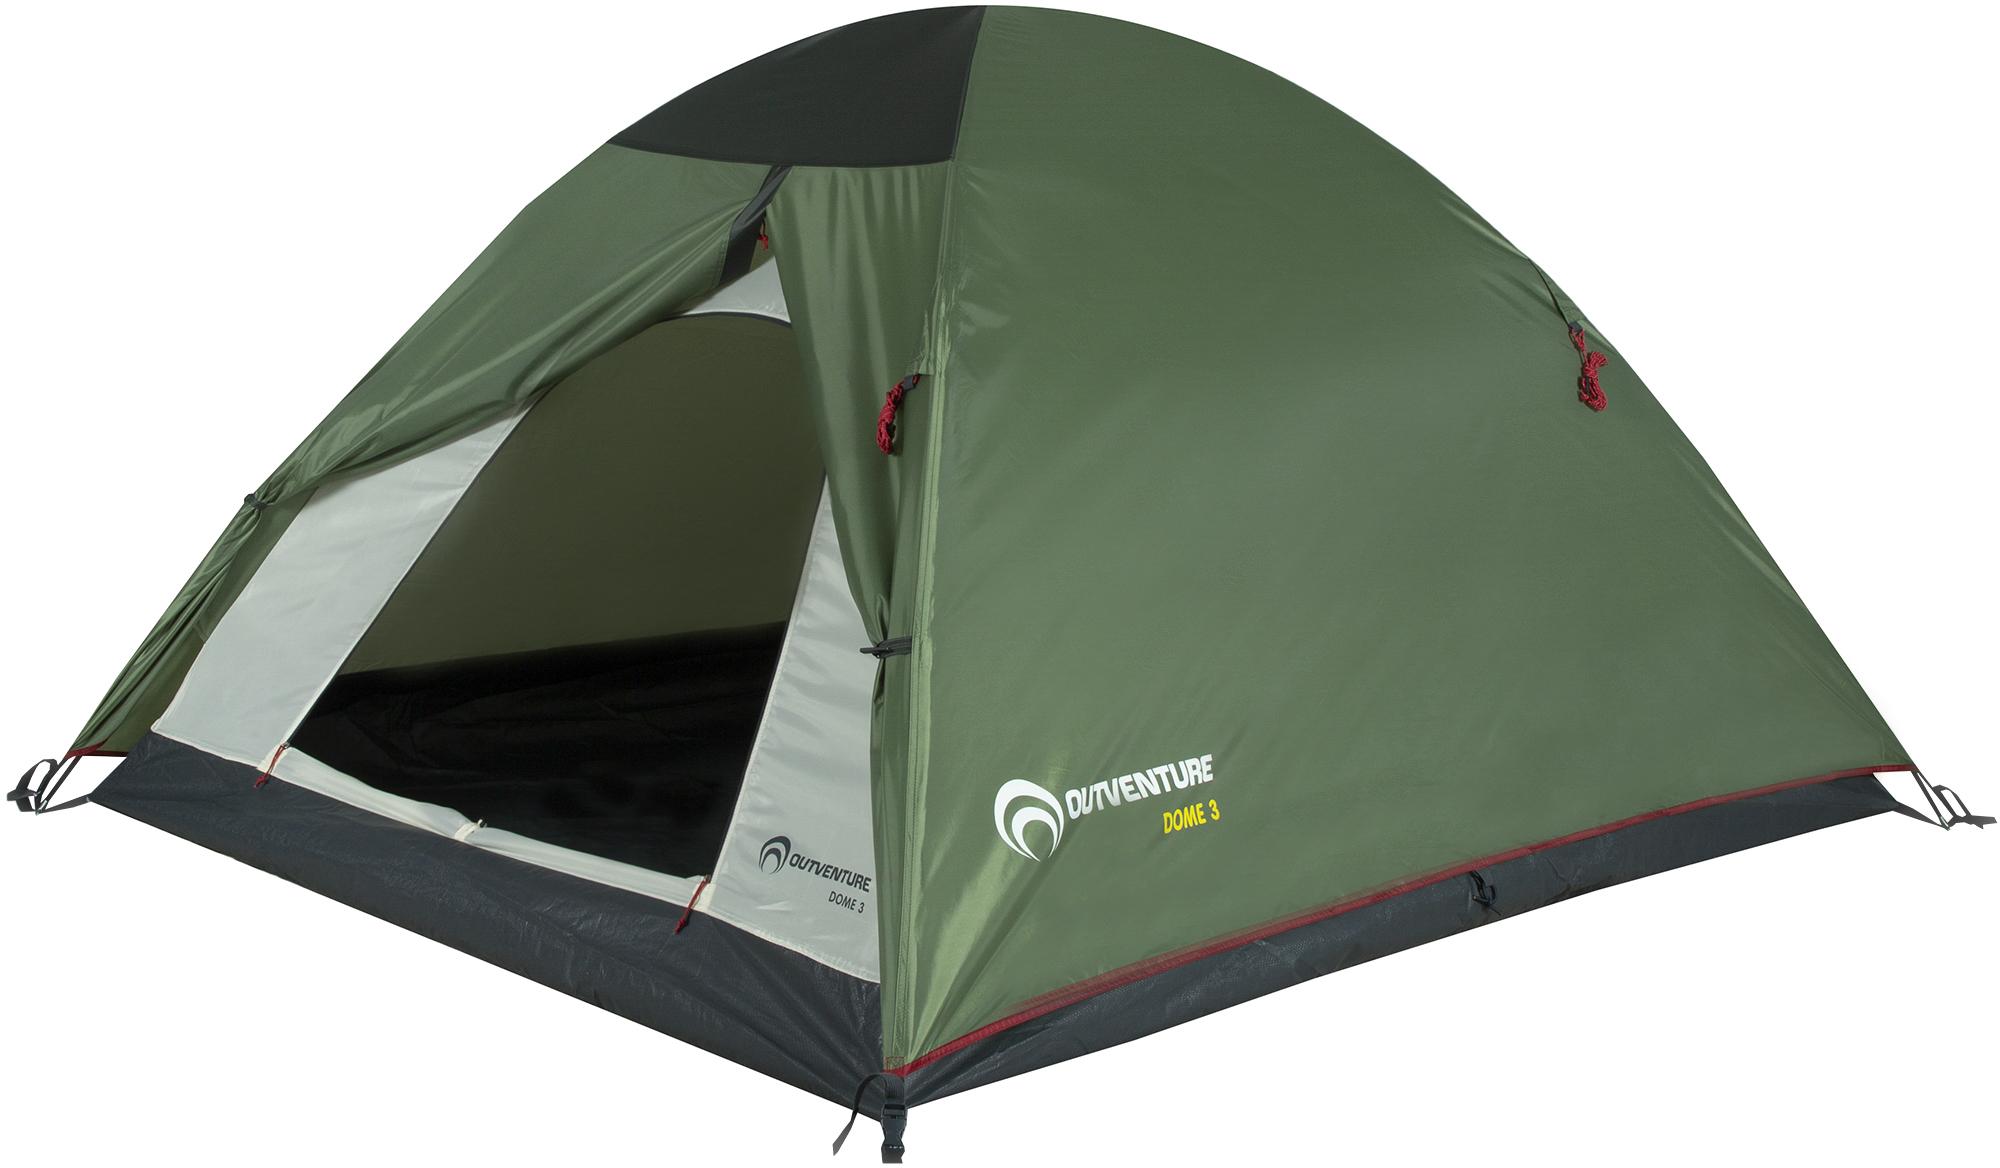 Фото - Outventure DOME 3 палатка greenhouse fct 32 трехместная